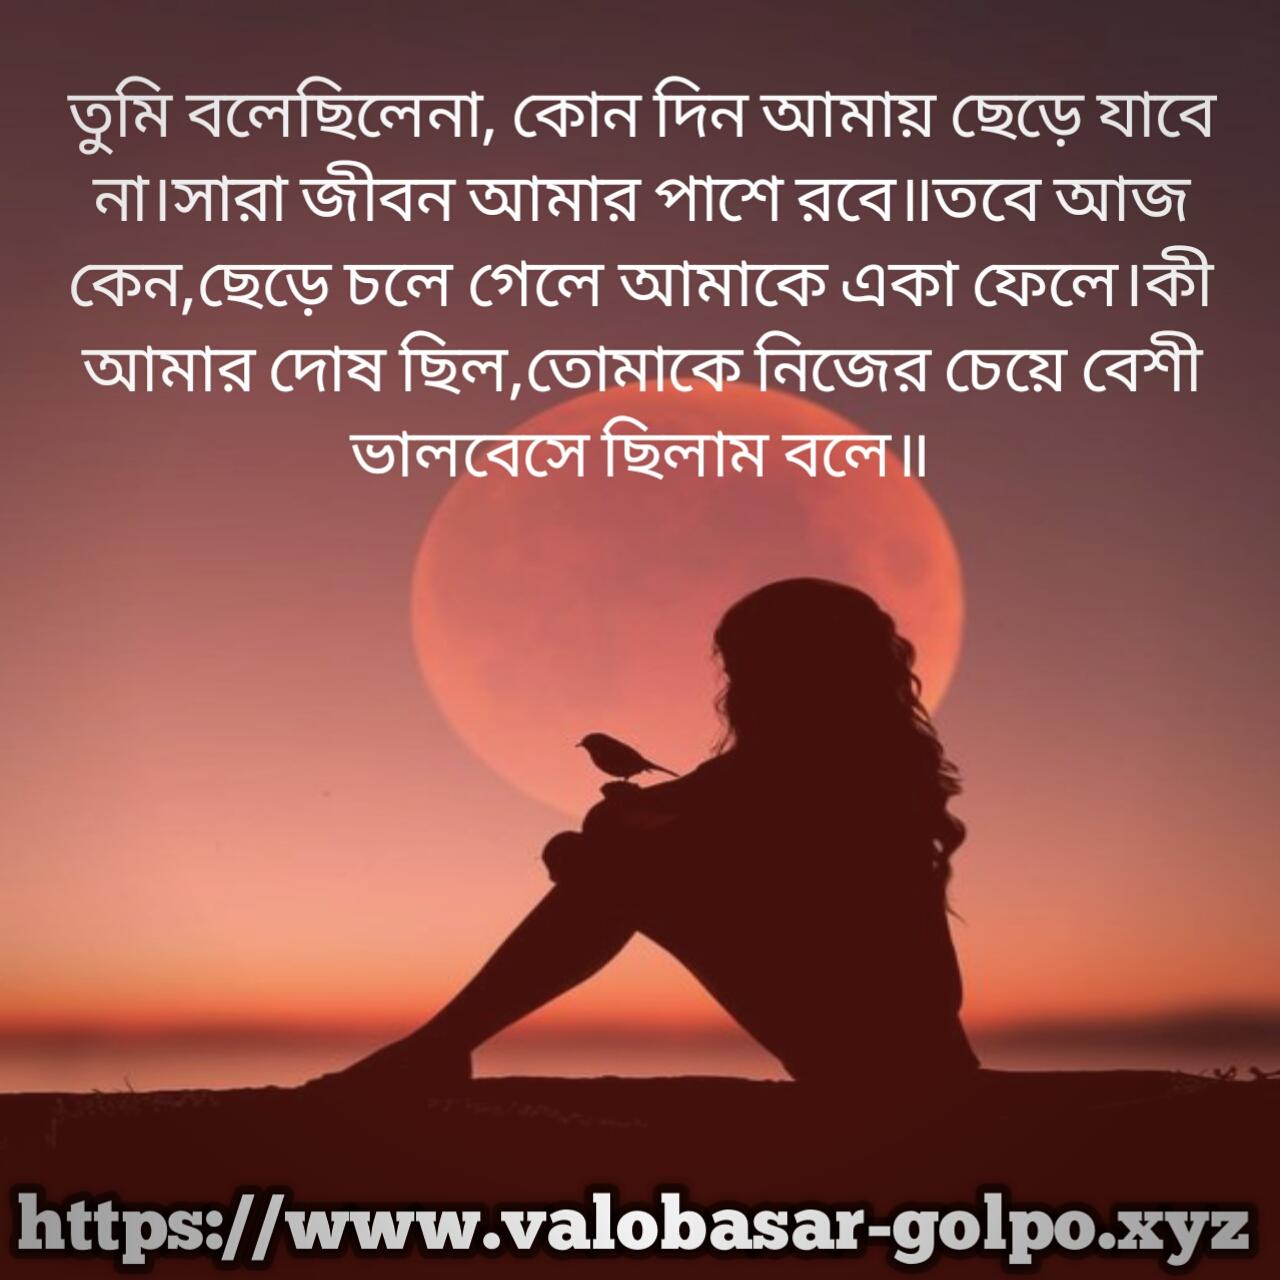 Bangla Koster Picture ,valobashar Koster Photo ,bengali - Girl Bird Moon Dpz - HD Wallpaper